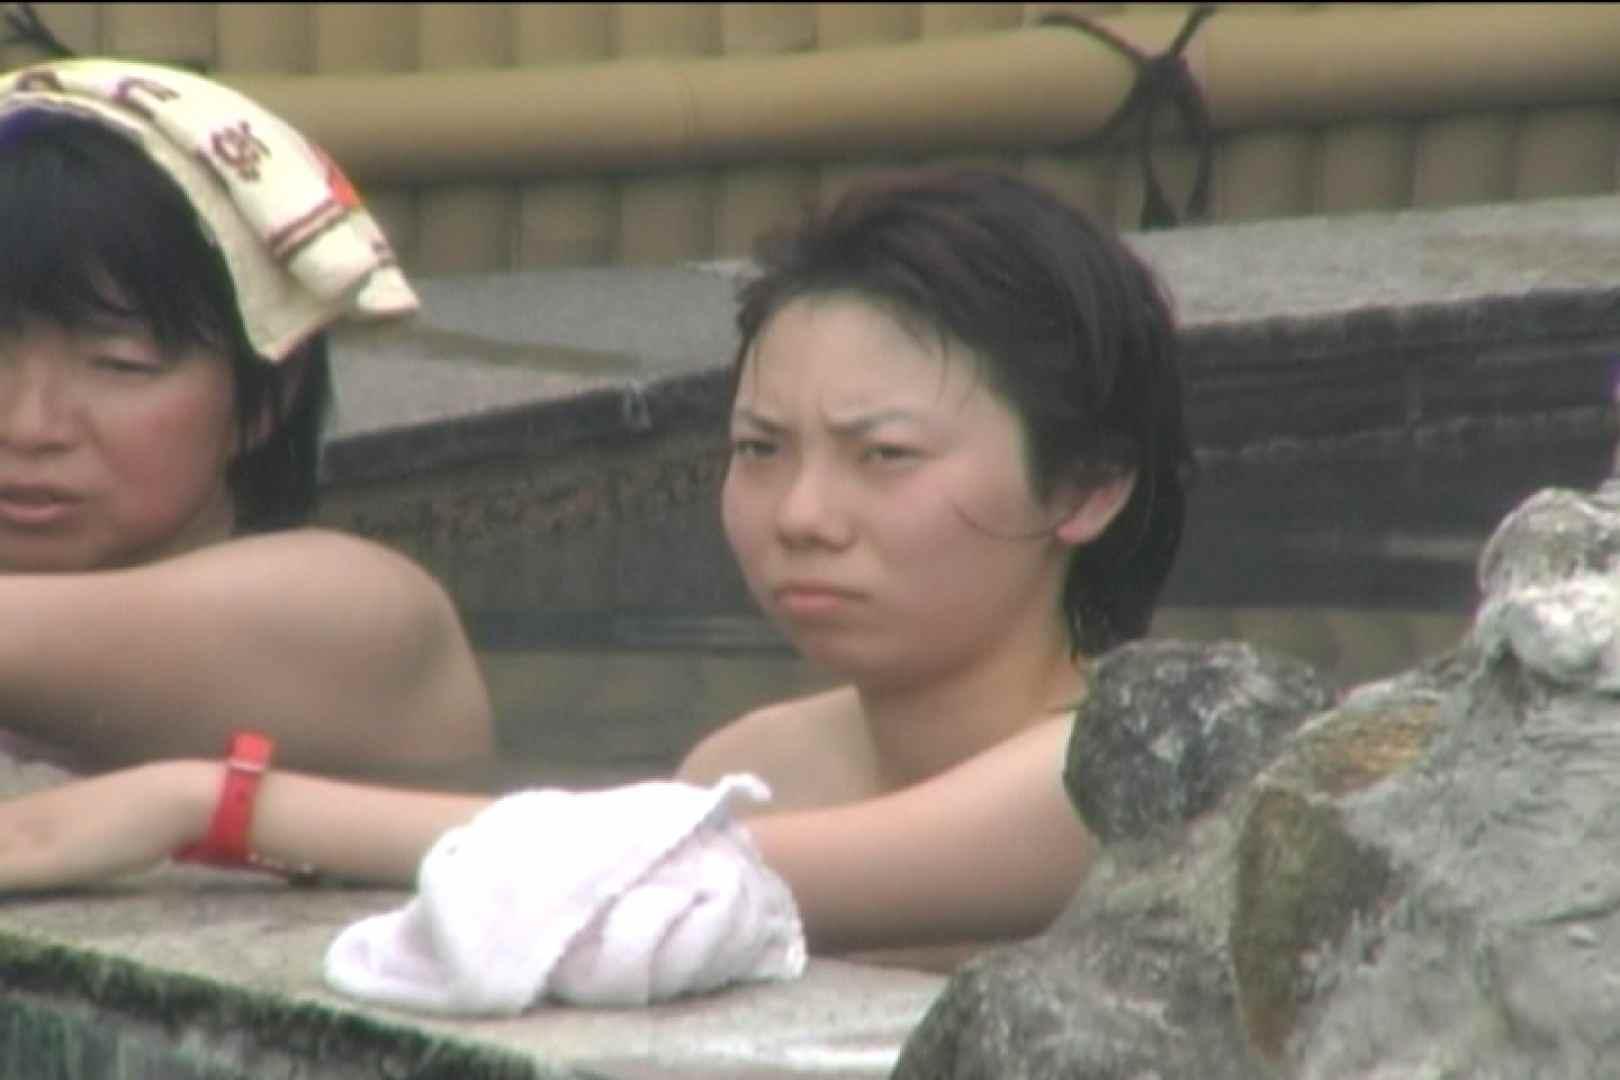 Aquaな露天風呂Vol.122 HなOL   0  107pic 17